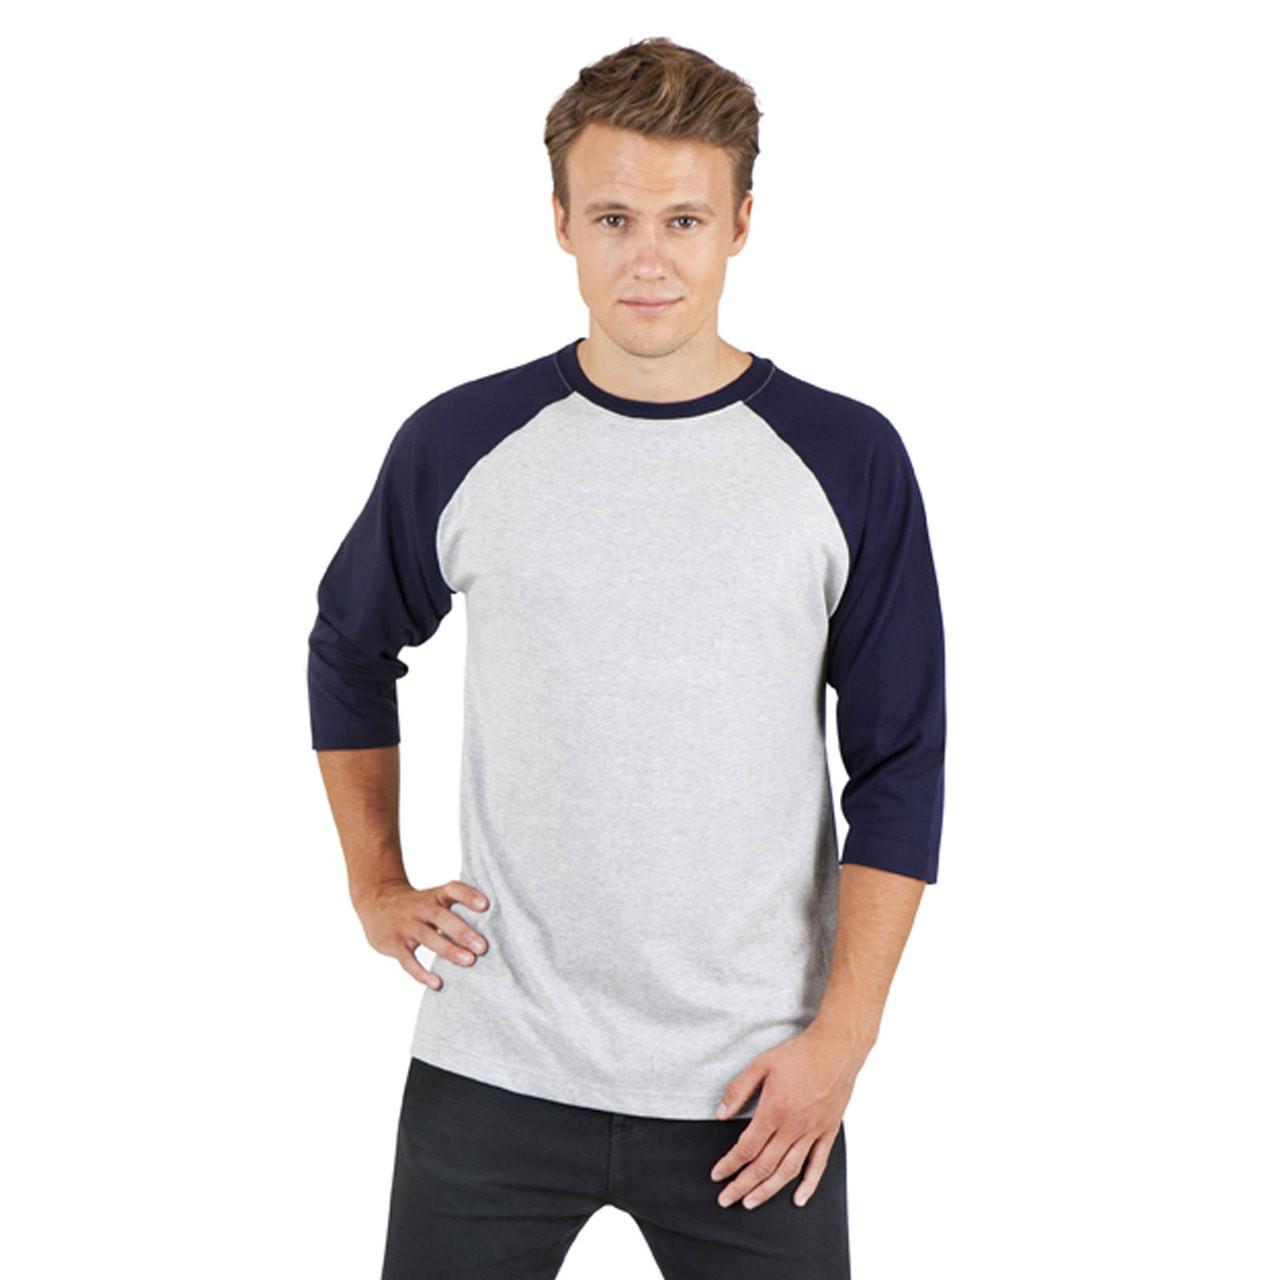 2ee245504a Blank men's baseball t-shirts 3/4 sleeves   Plain T Shirts   Wholesale T  Shirts